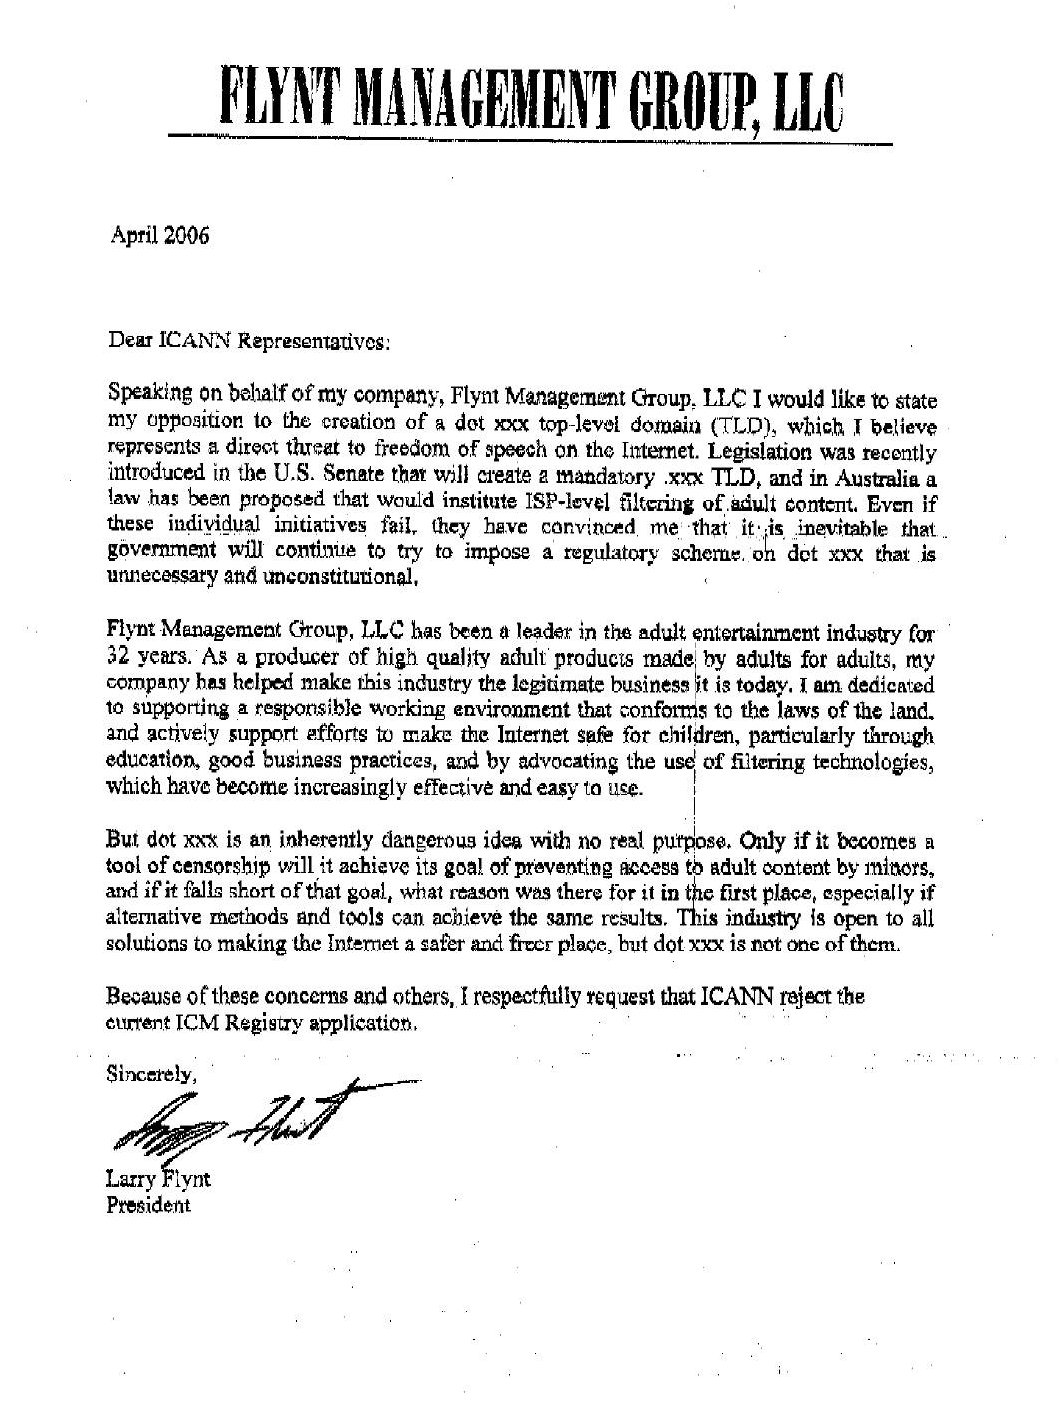 2006 ICANN Correspondence - ICANN